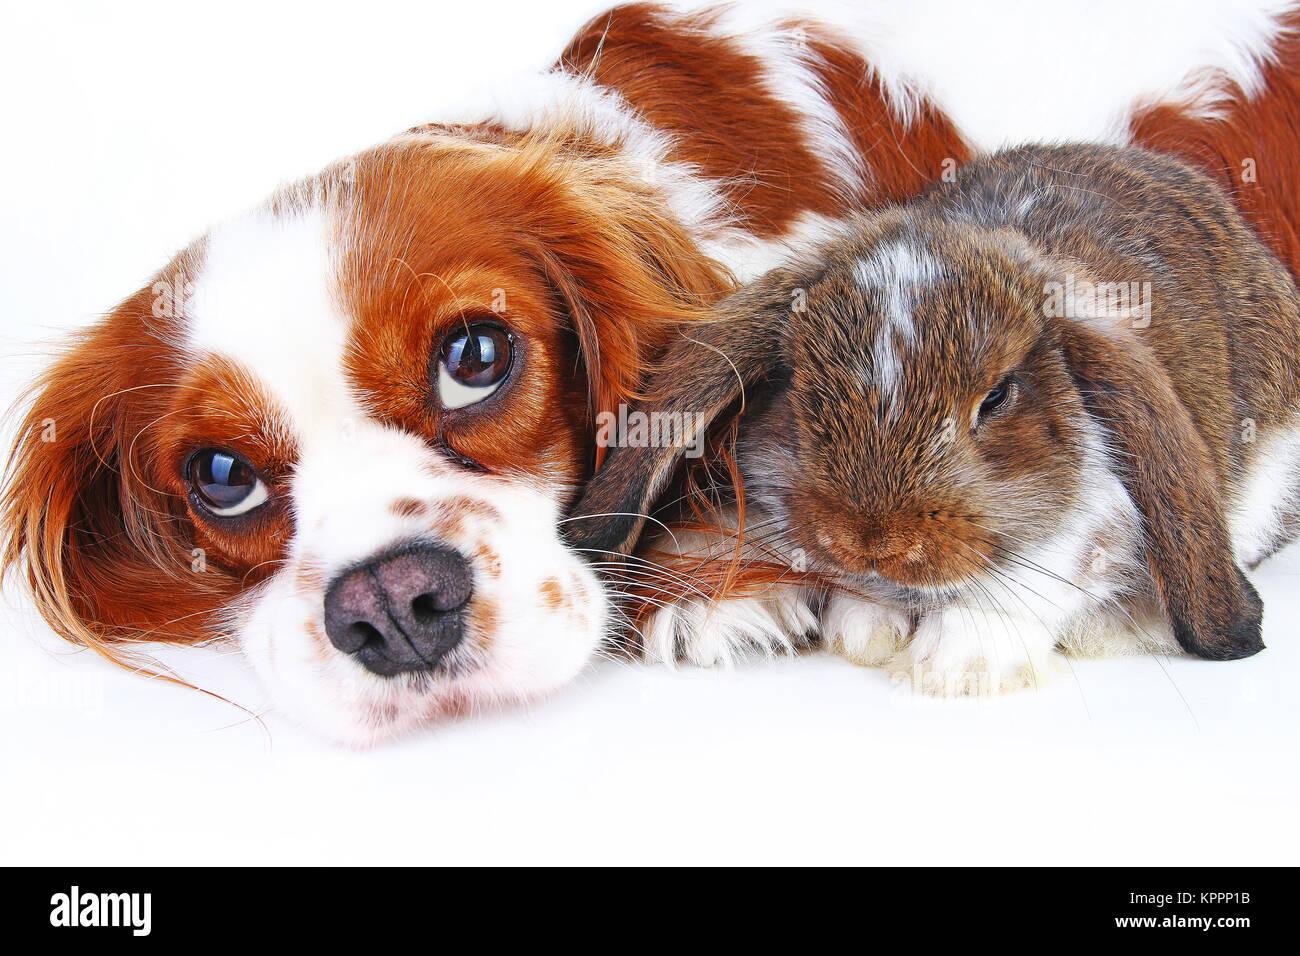 Rencontres amis des animaux